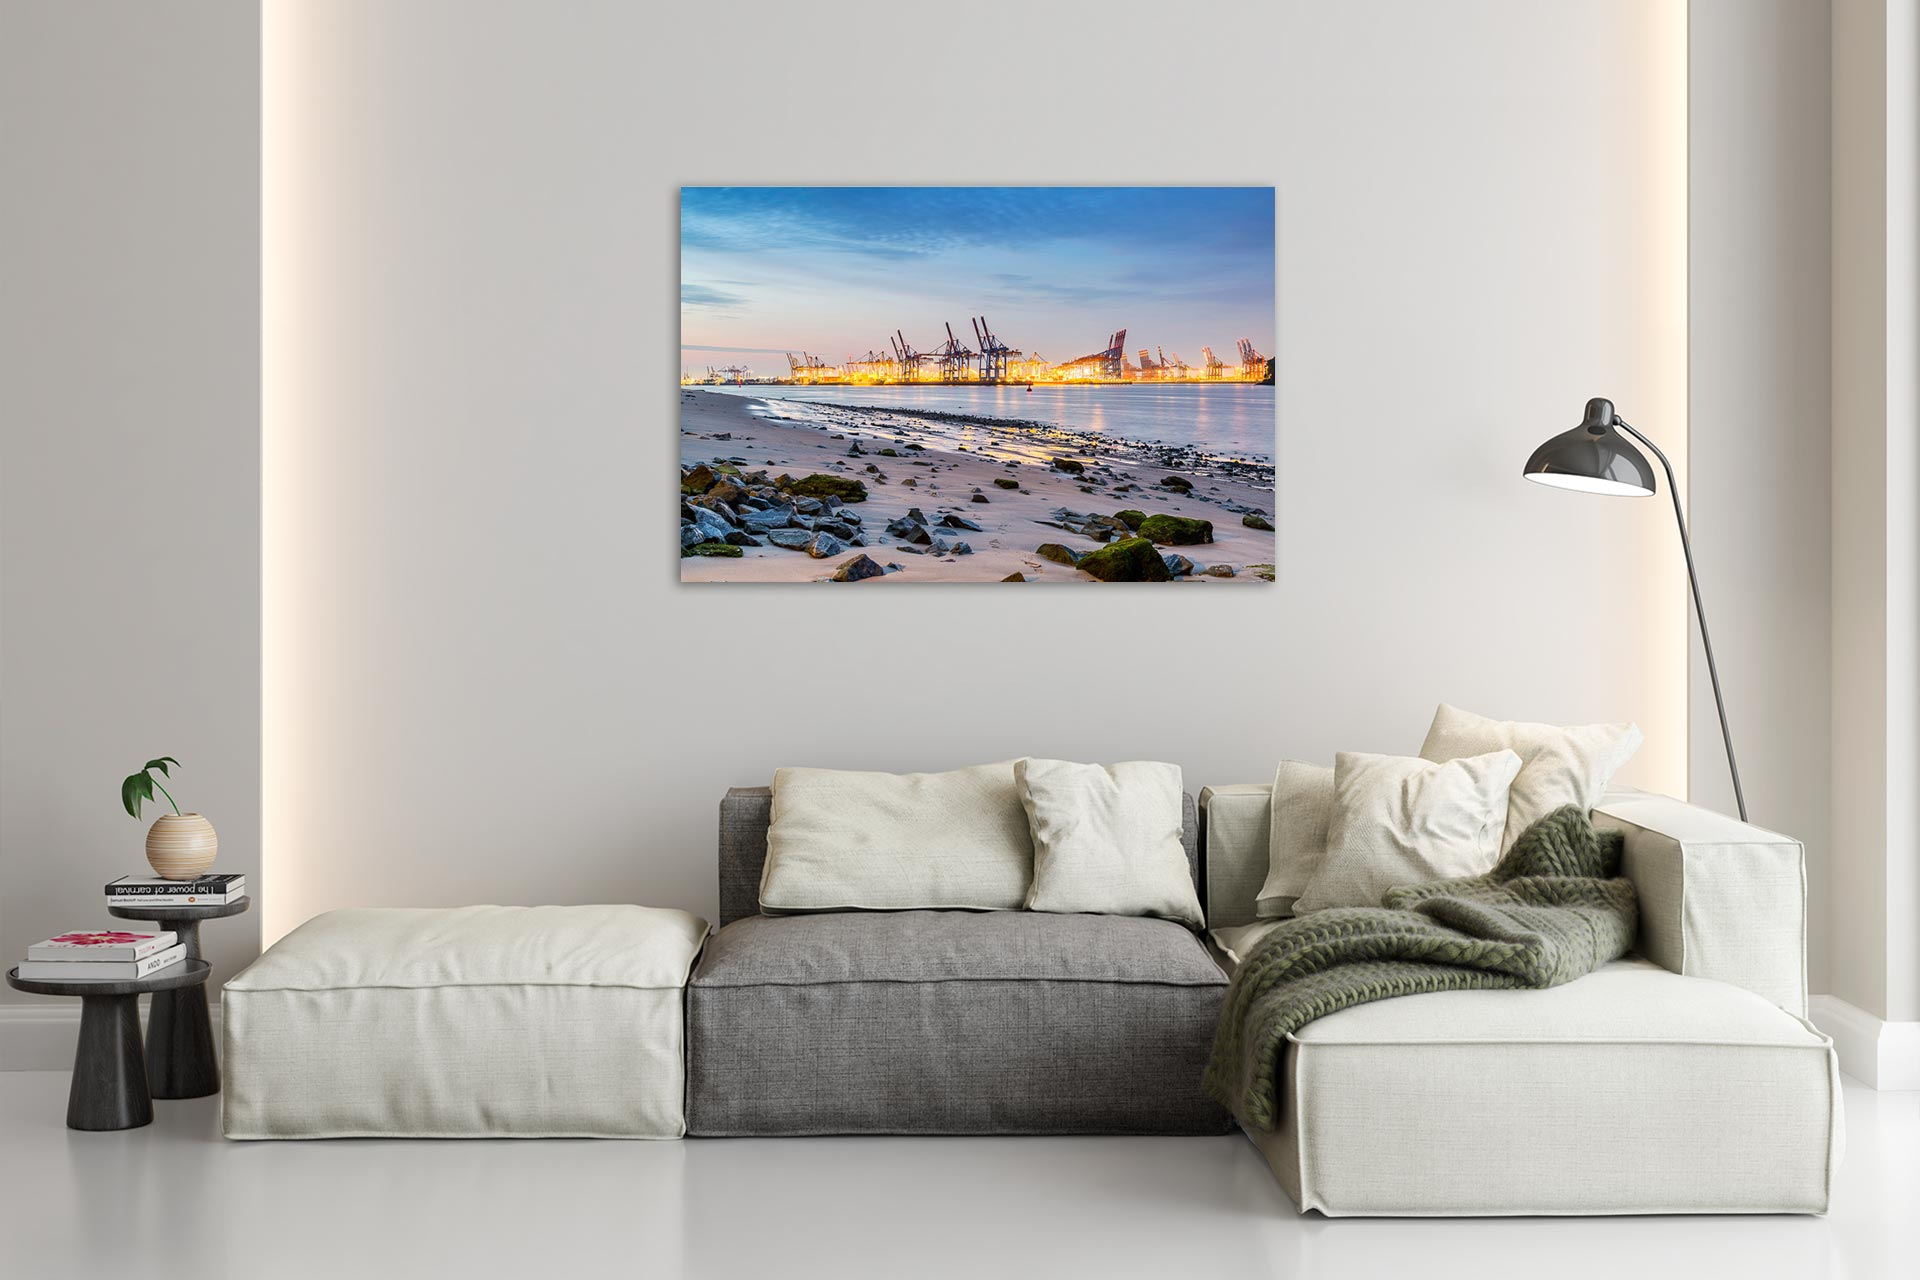 JS092-morgendaemerung-wandbild-bild-auf-leinwand-acrylglas-aludibond-wohnzimmer